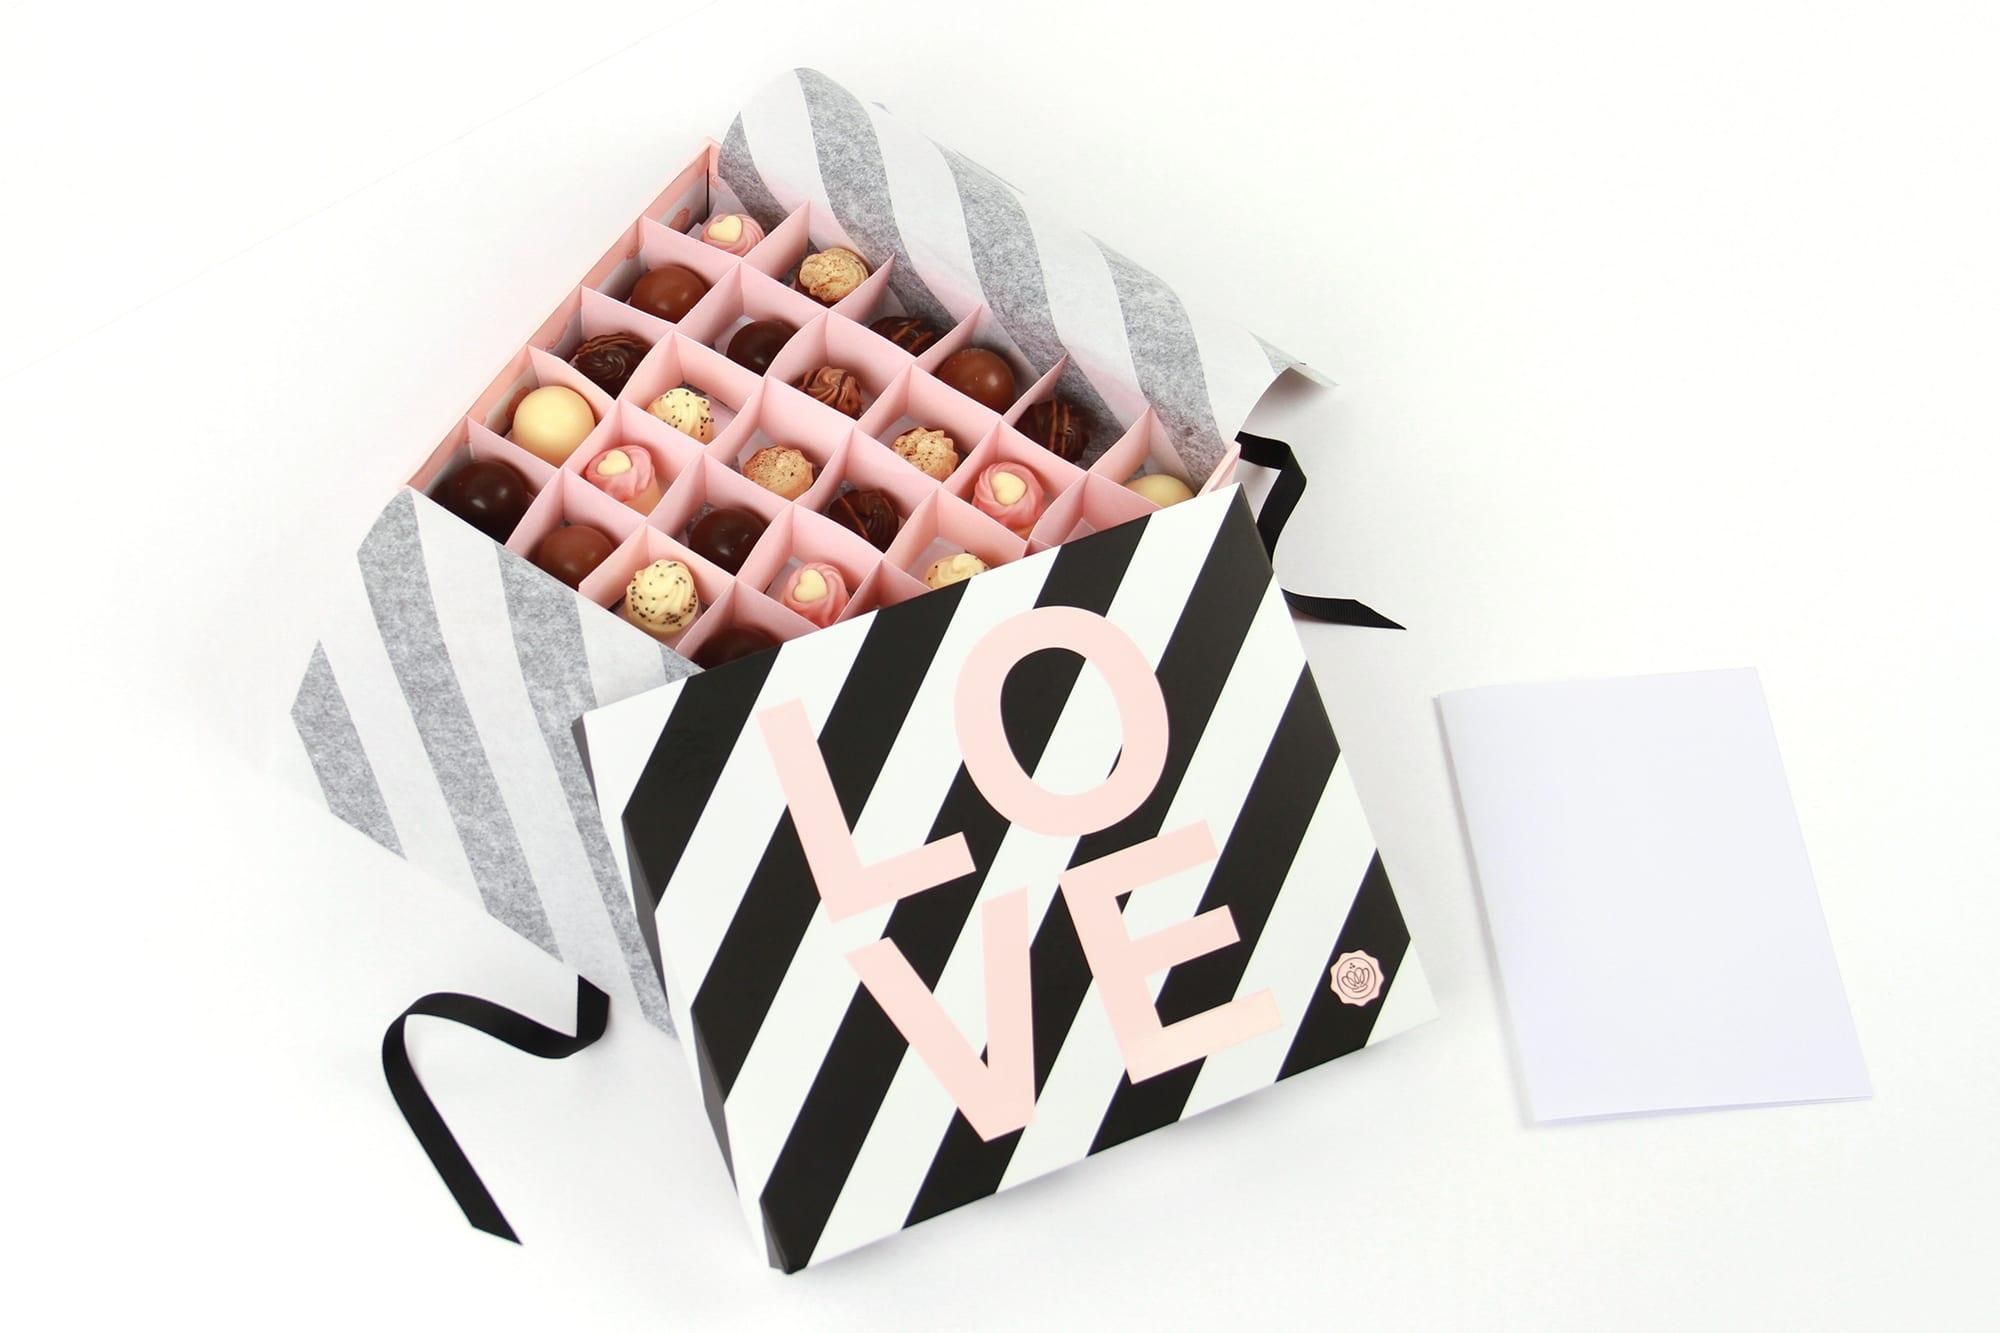 Upscale Your GLOSSYBOX: Chocolate Box